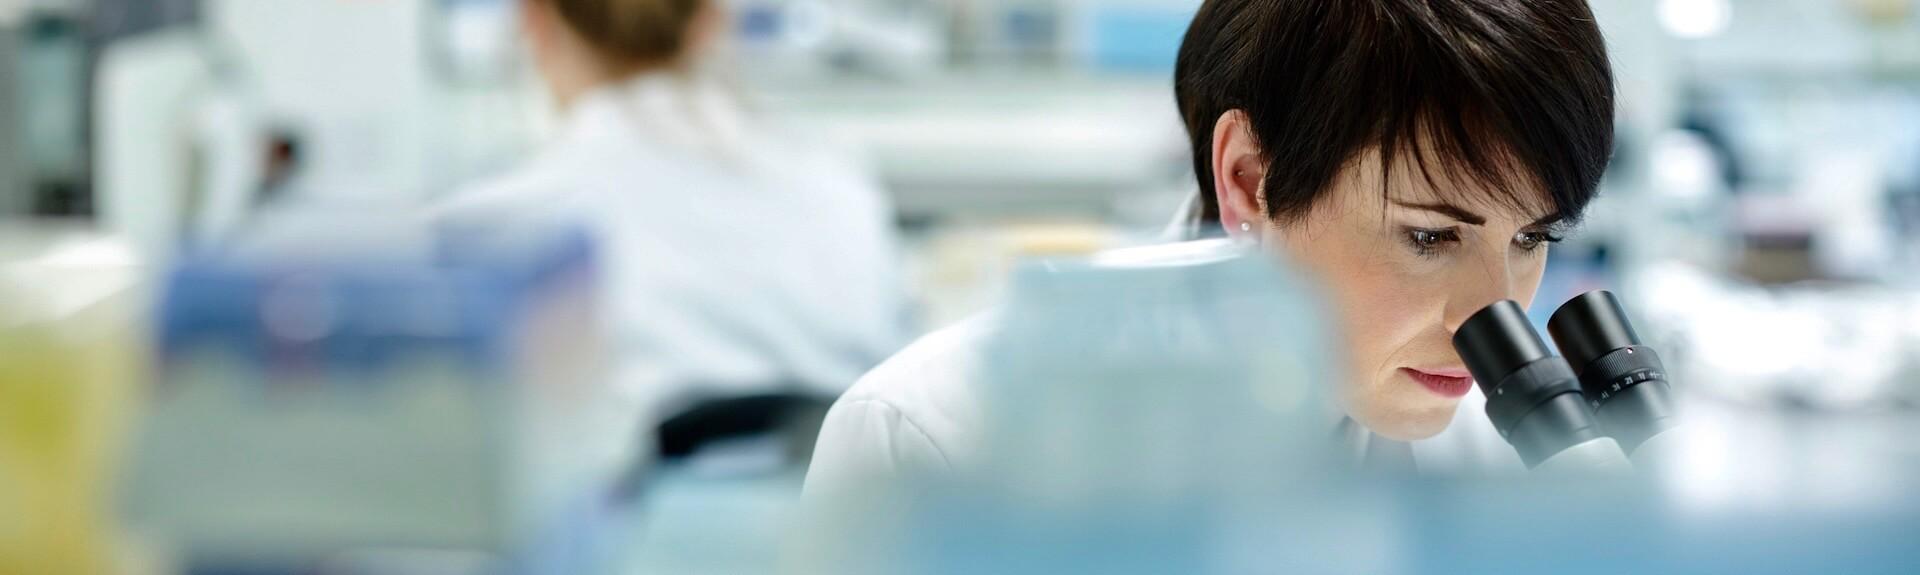 Microbiologiste effectuant des analyses au microscope